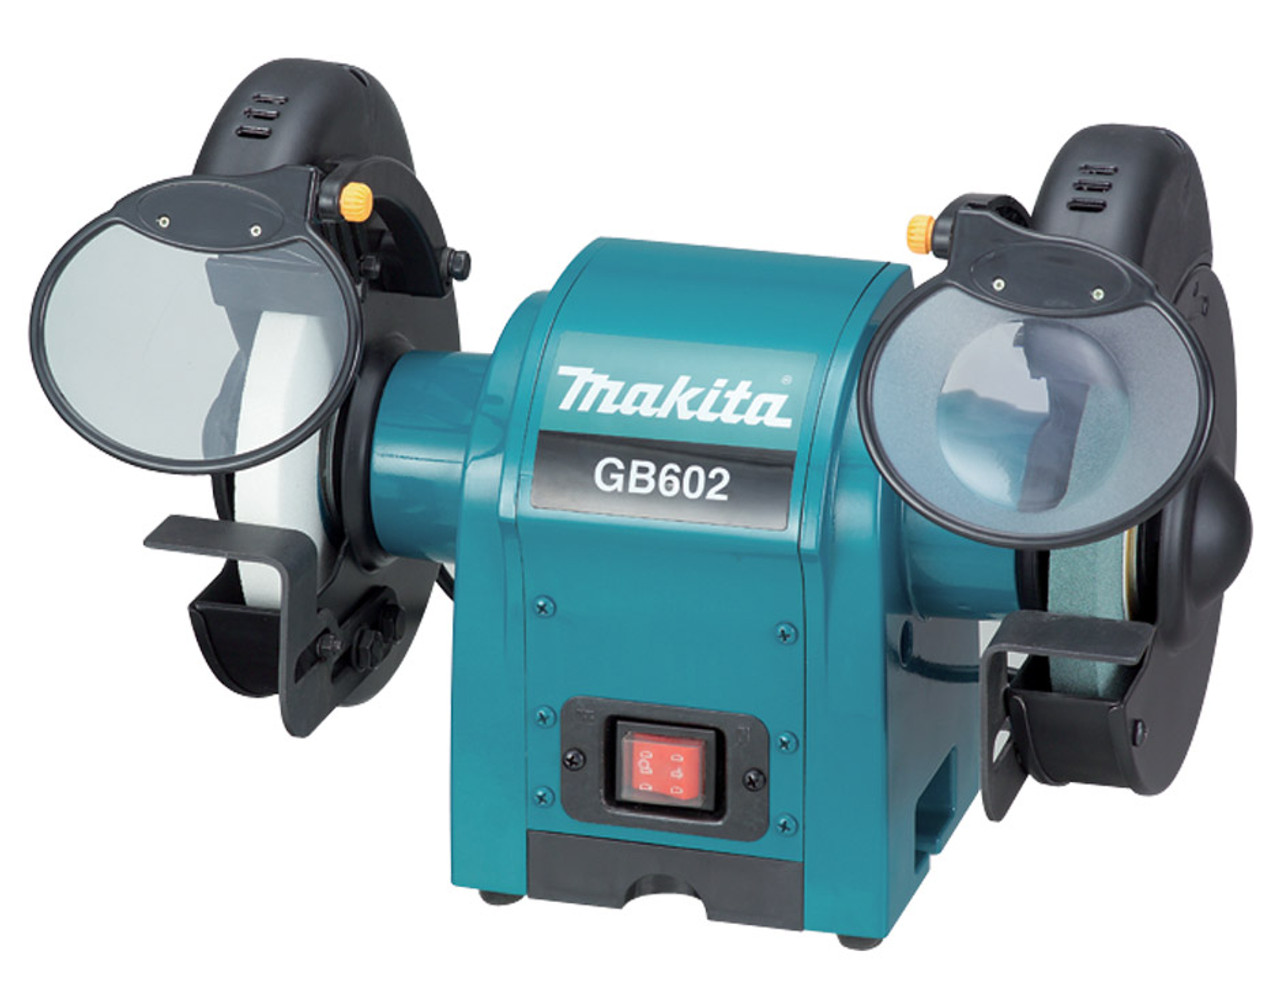 Makita Bench Grinder, 150mm x 16mm, 250W GB602